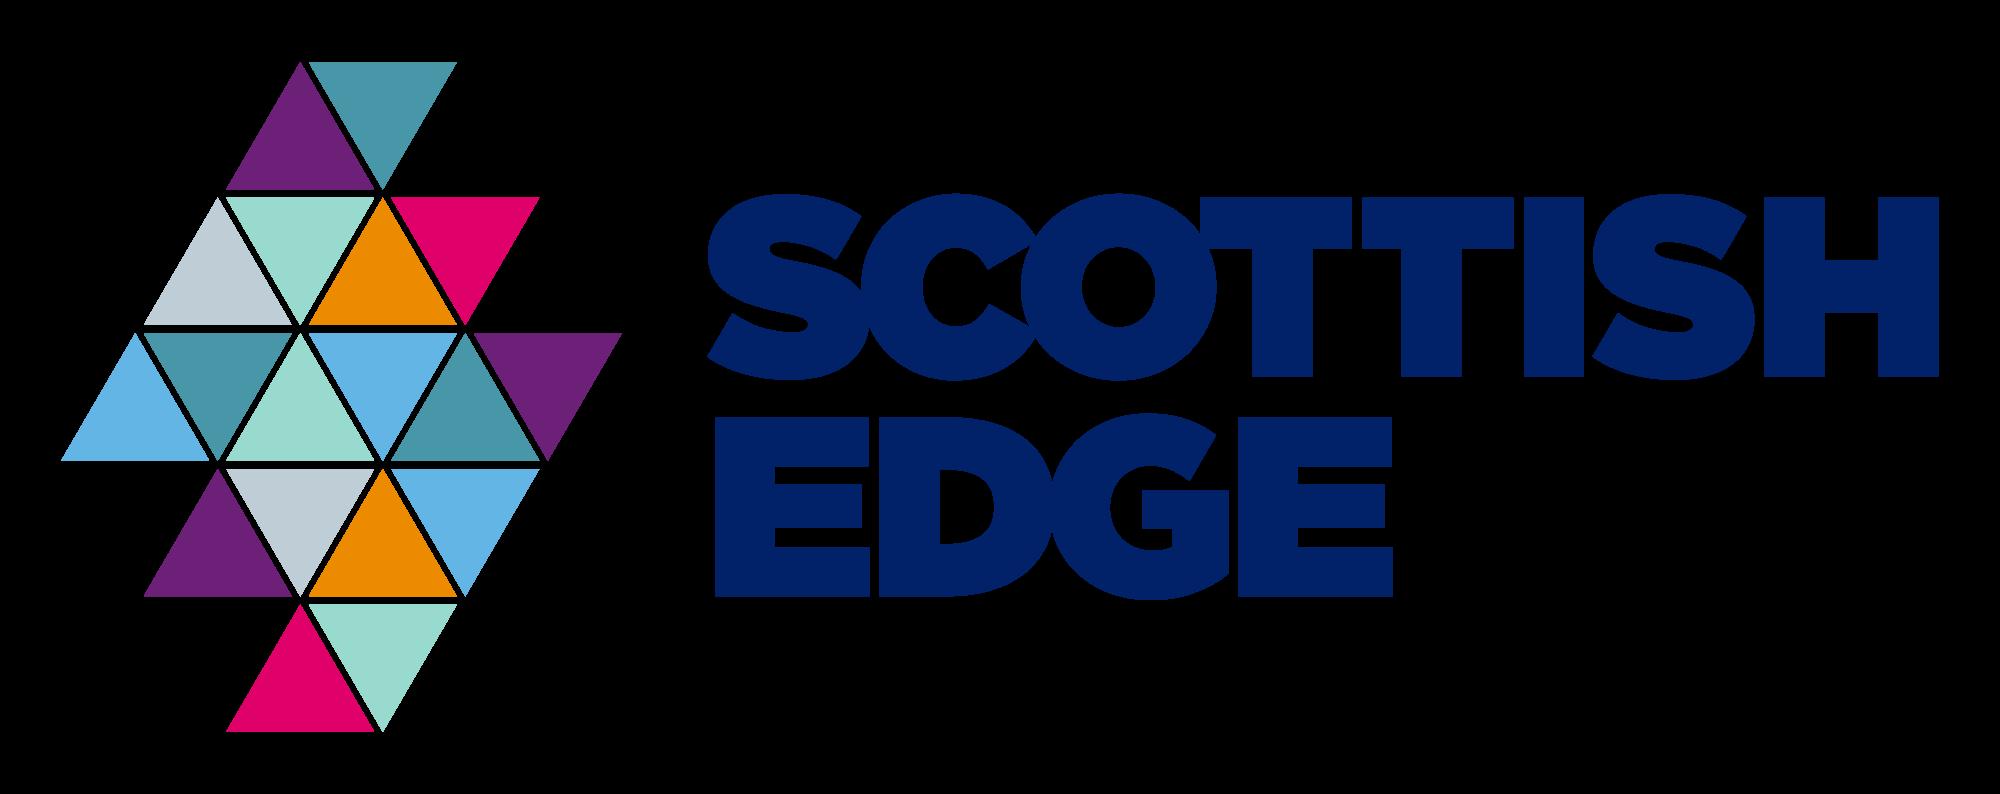 Scottish Edge: Creative EDGE, Social EDGE, Circular Economy EDGE now open